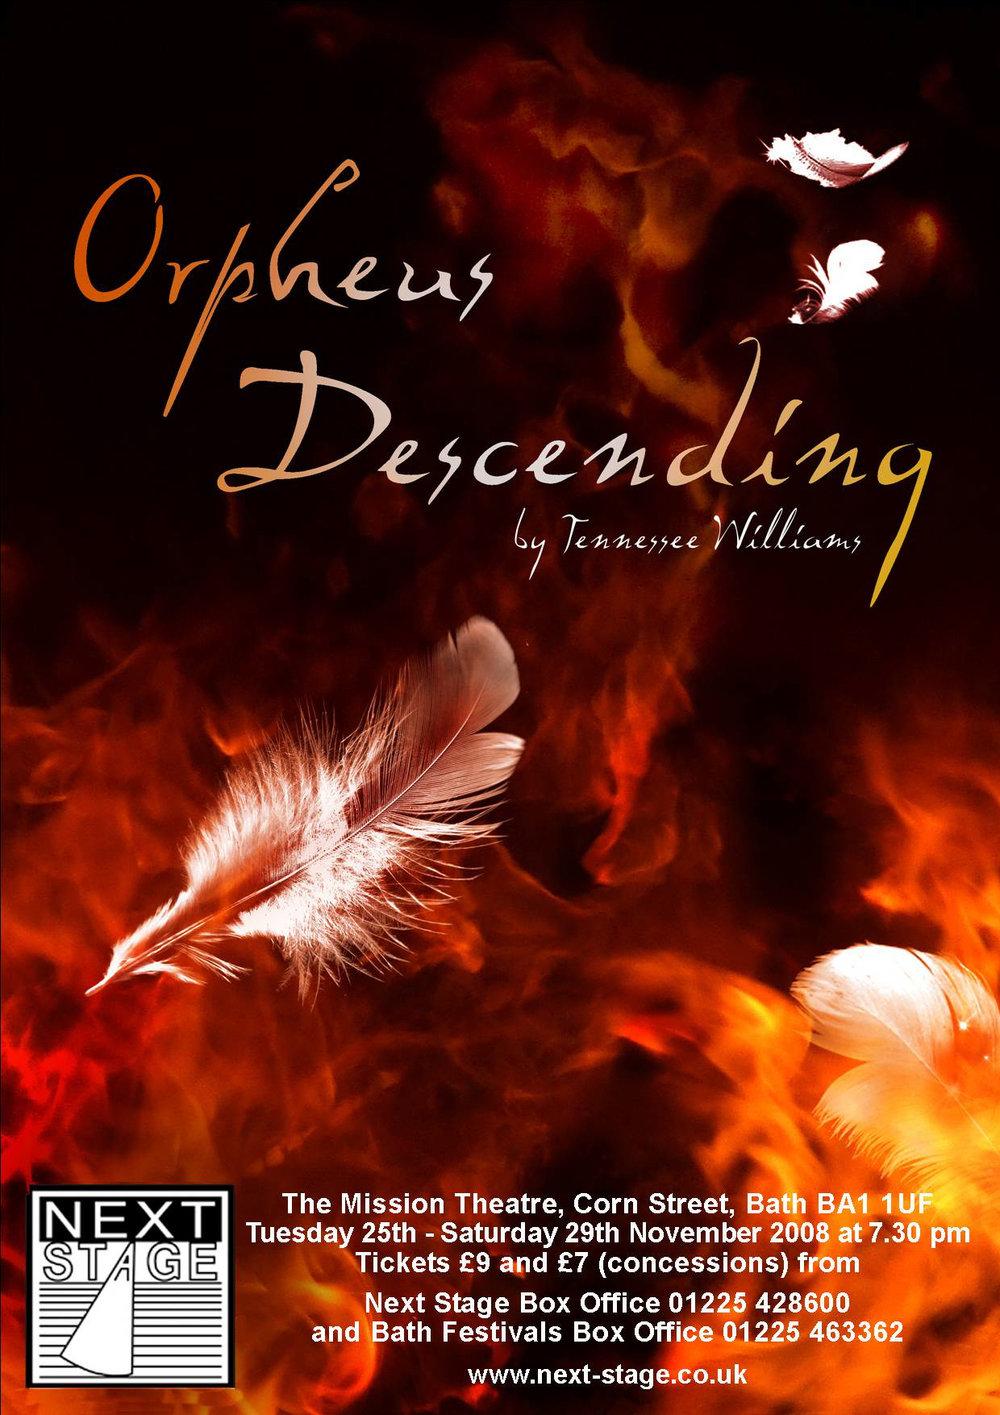 orpheus A4 poster.jpg